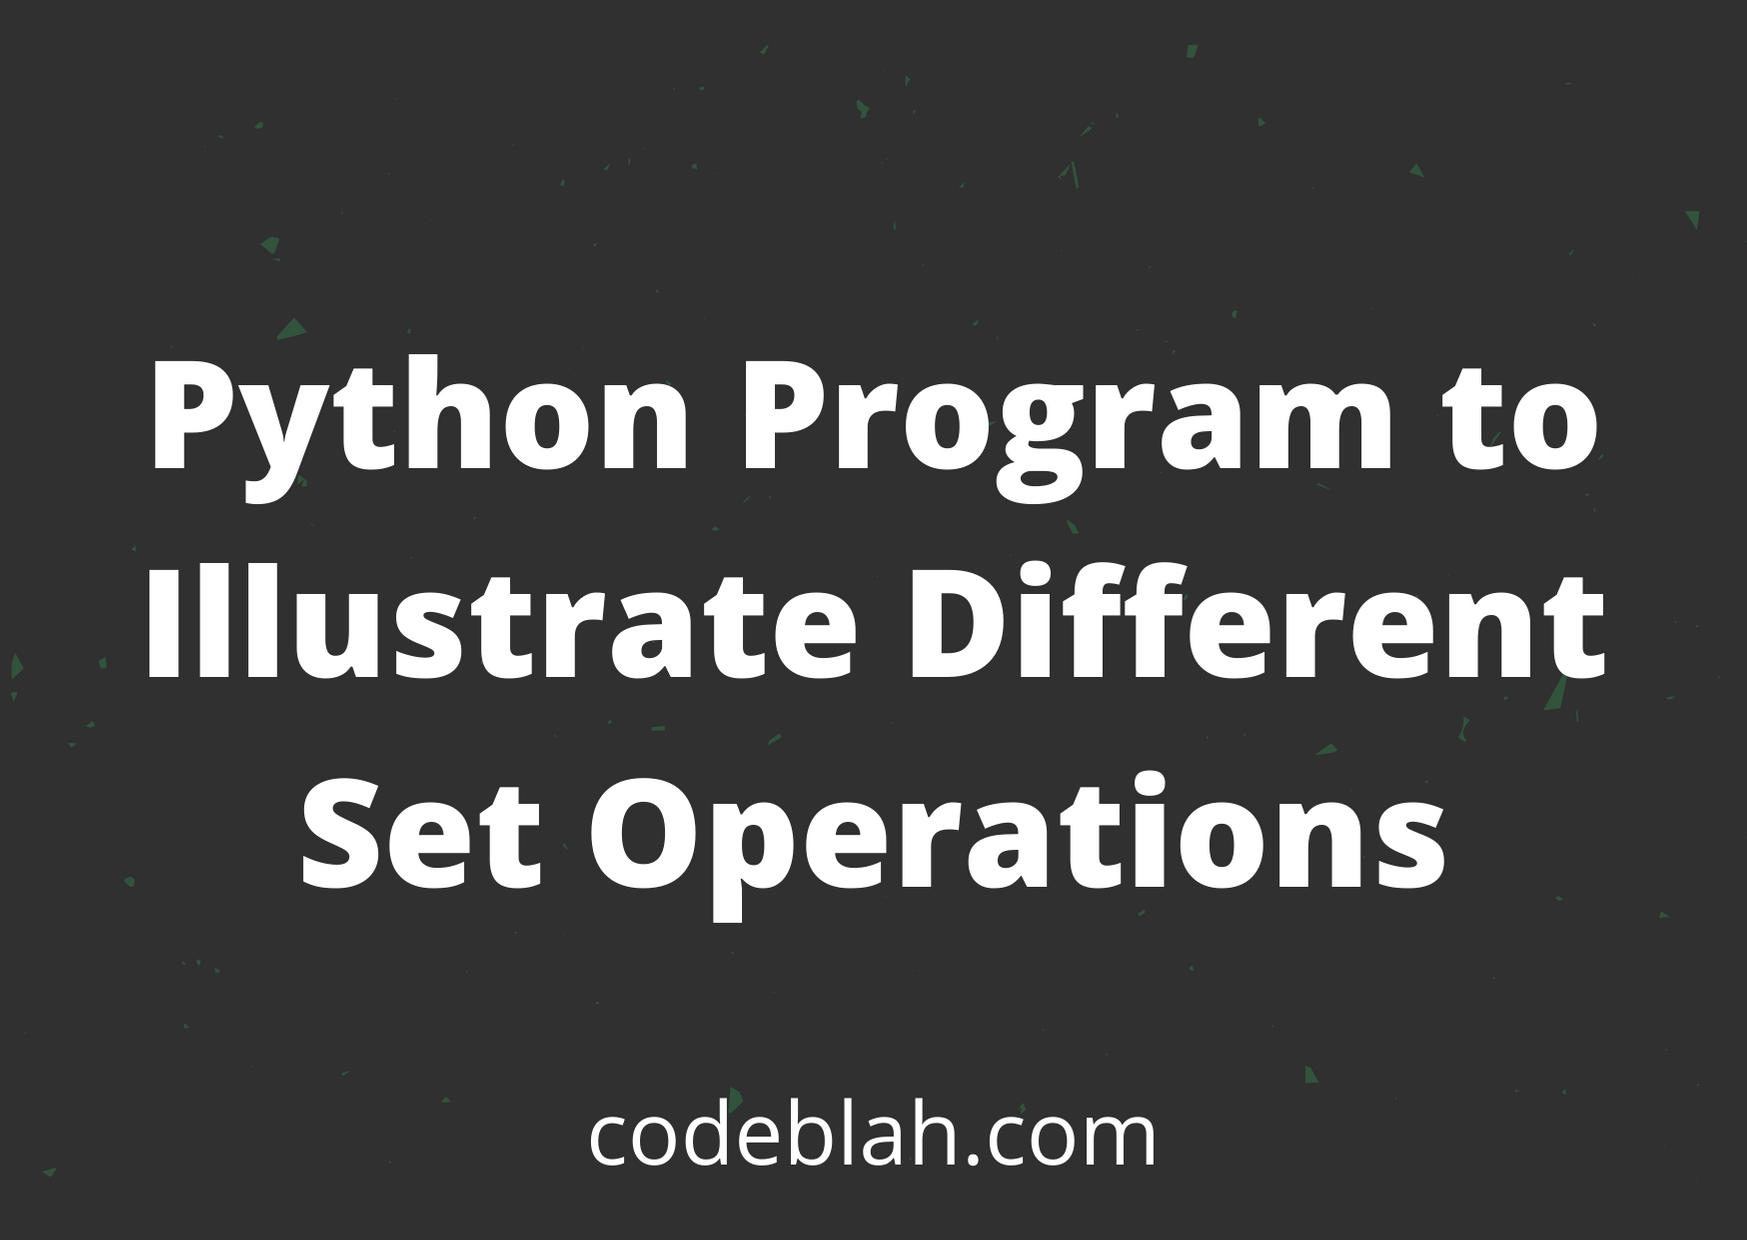 Python Program to Illustrate Different Set Operations